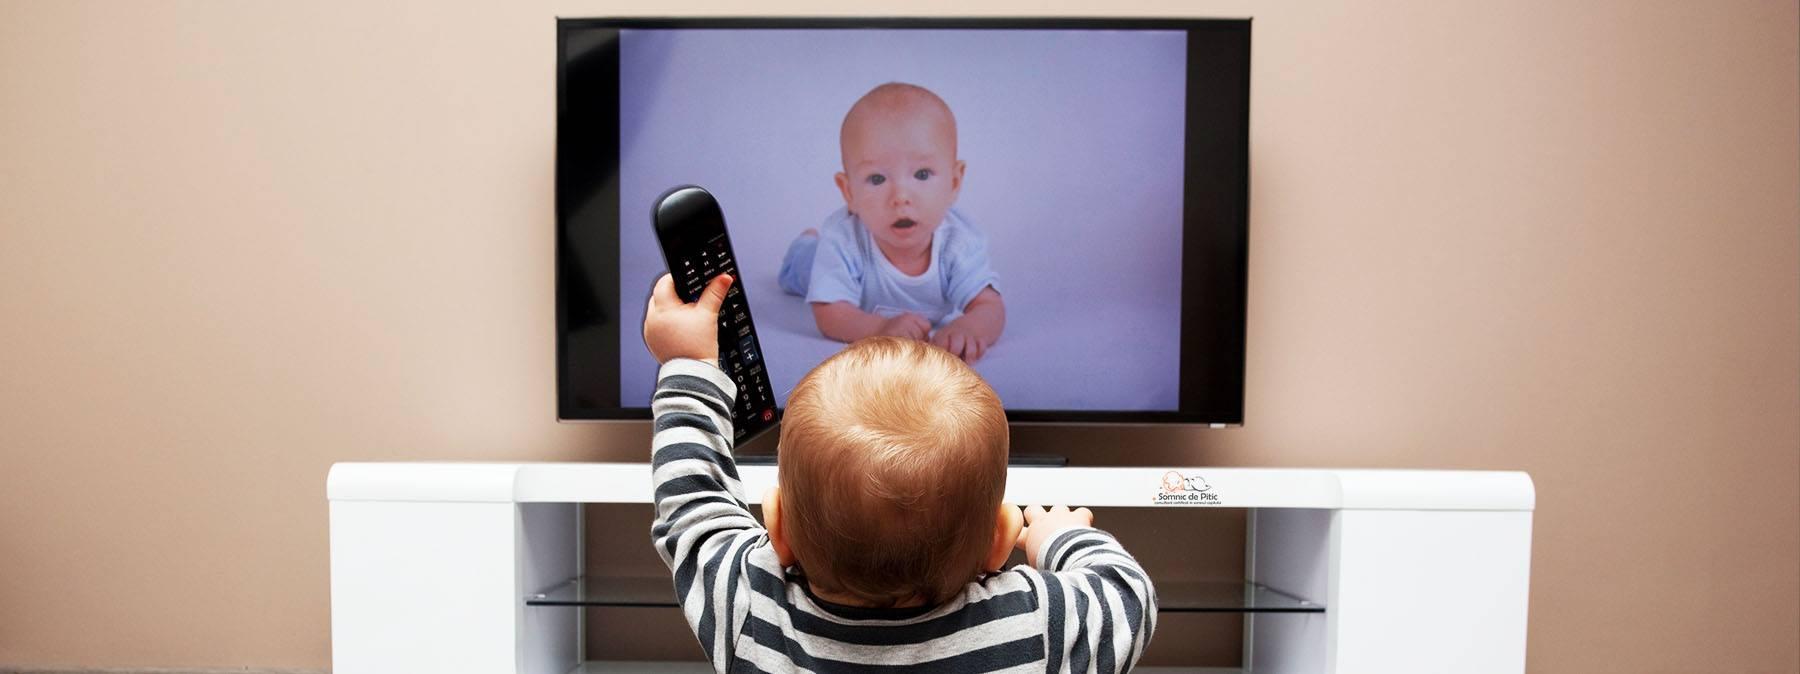 Bebelusii dorm mai bine cu televizorul pornit?